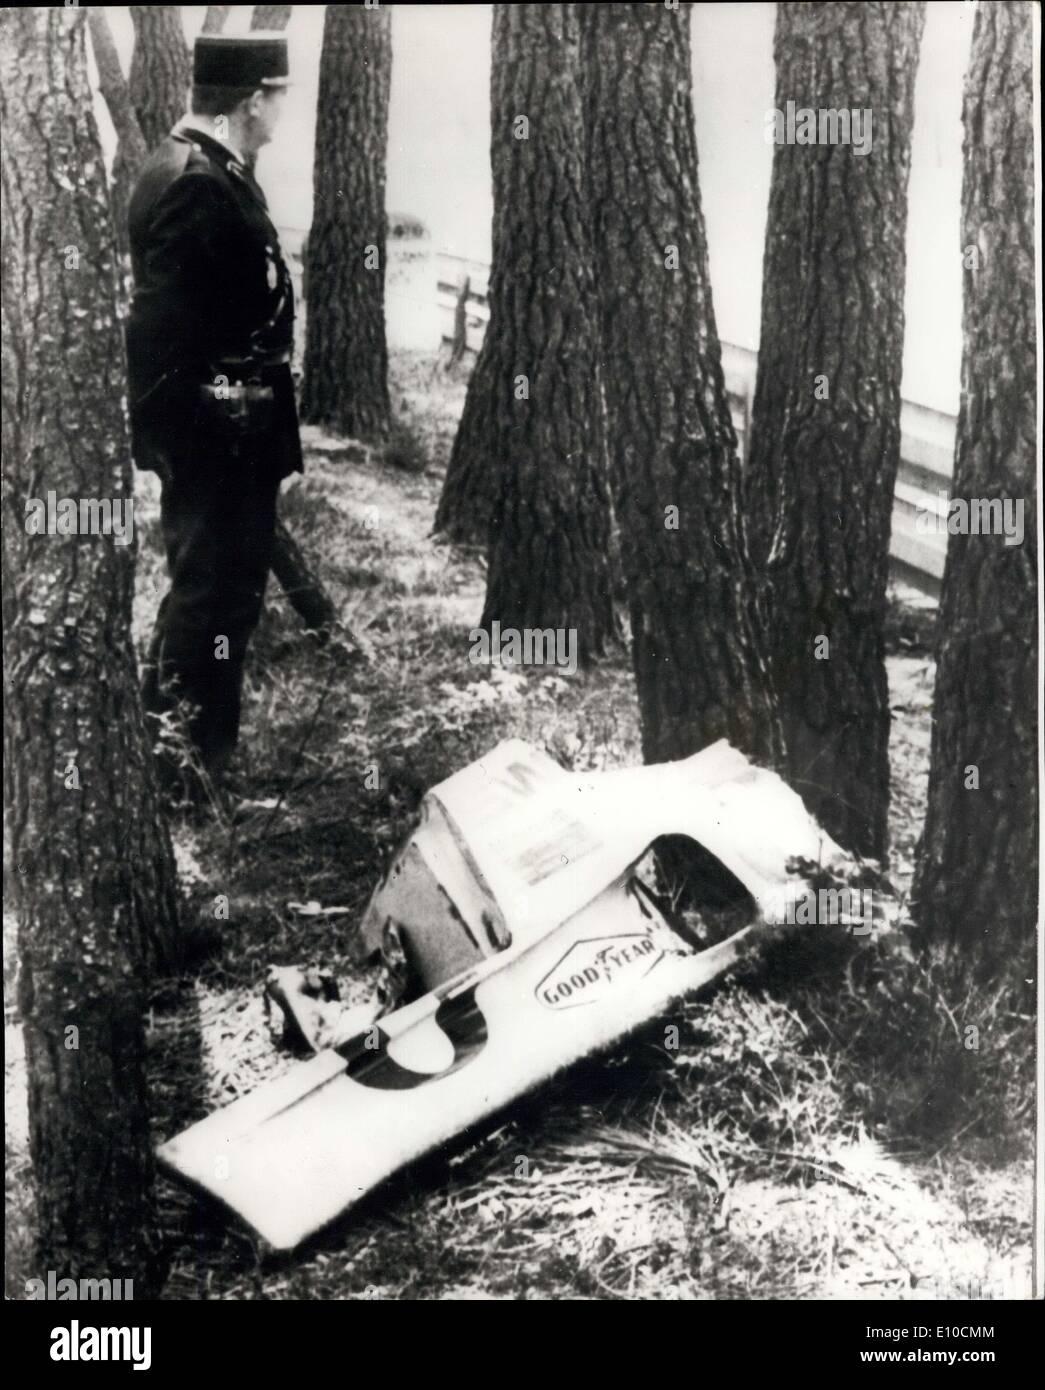 Jun. 12, 1972 - Jo Bonnier Killed in Le mans Crash ...